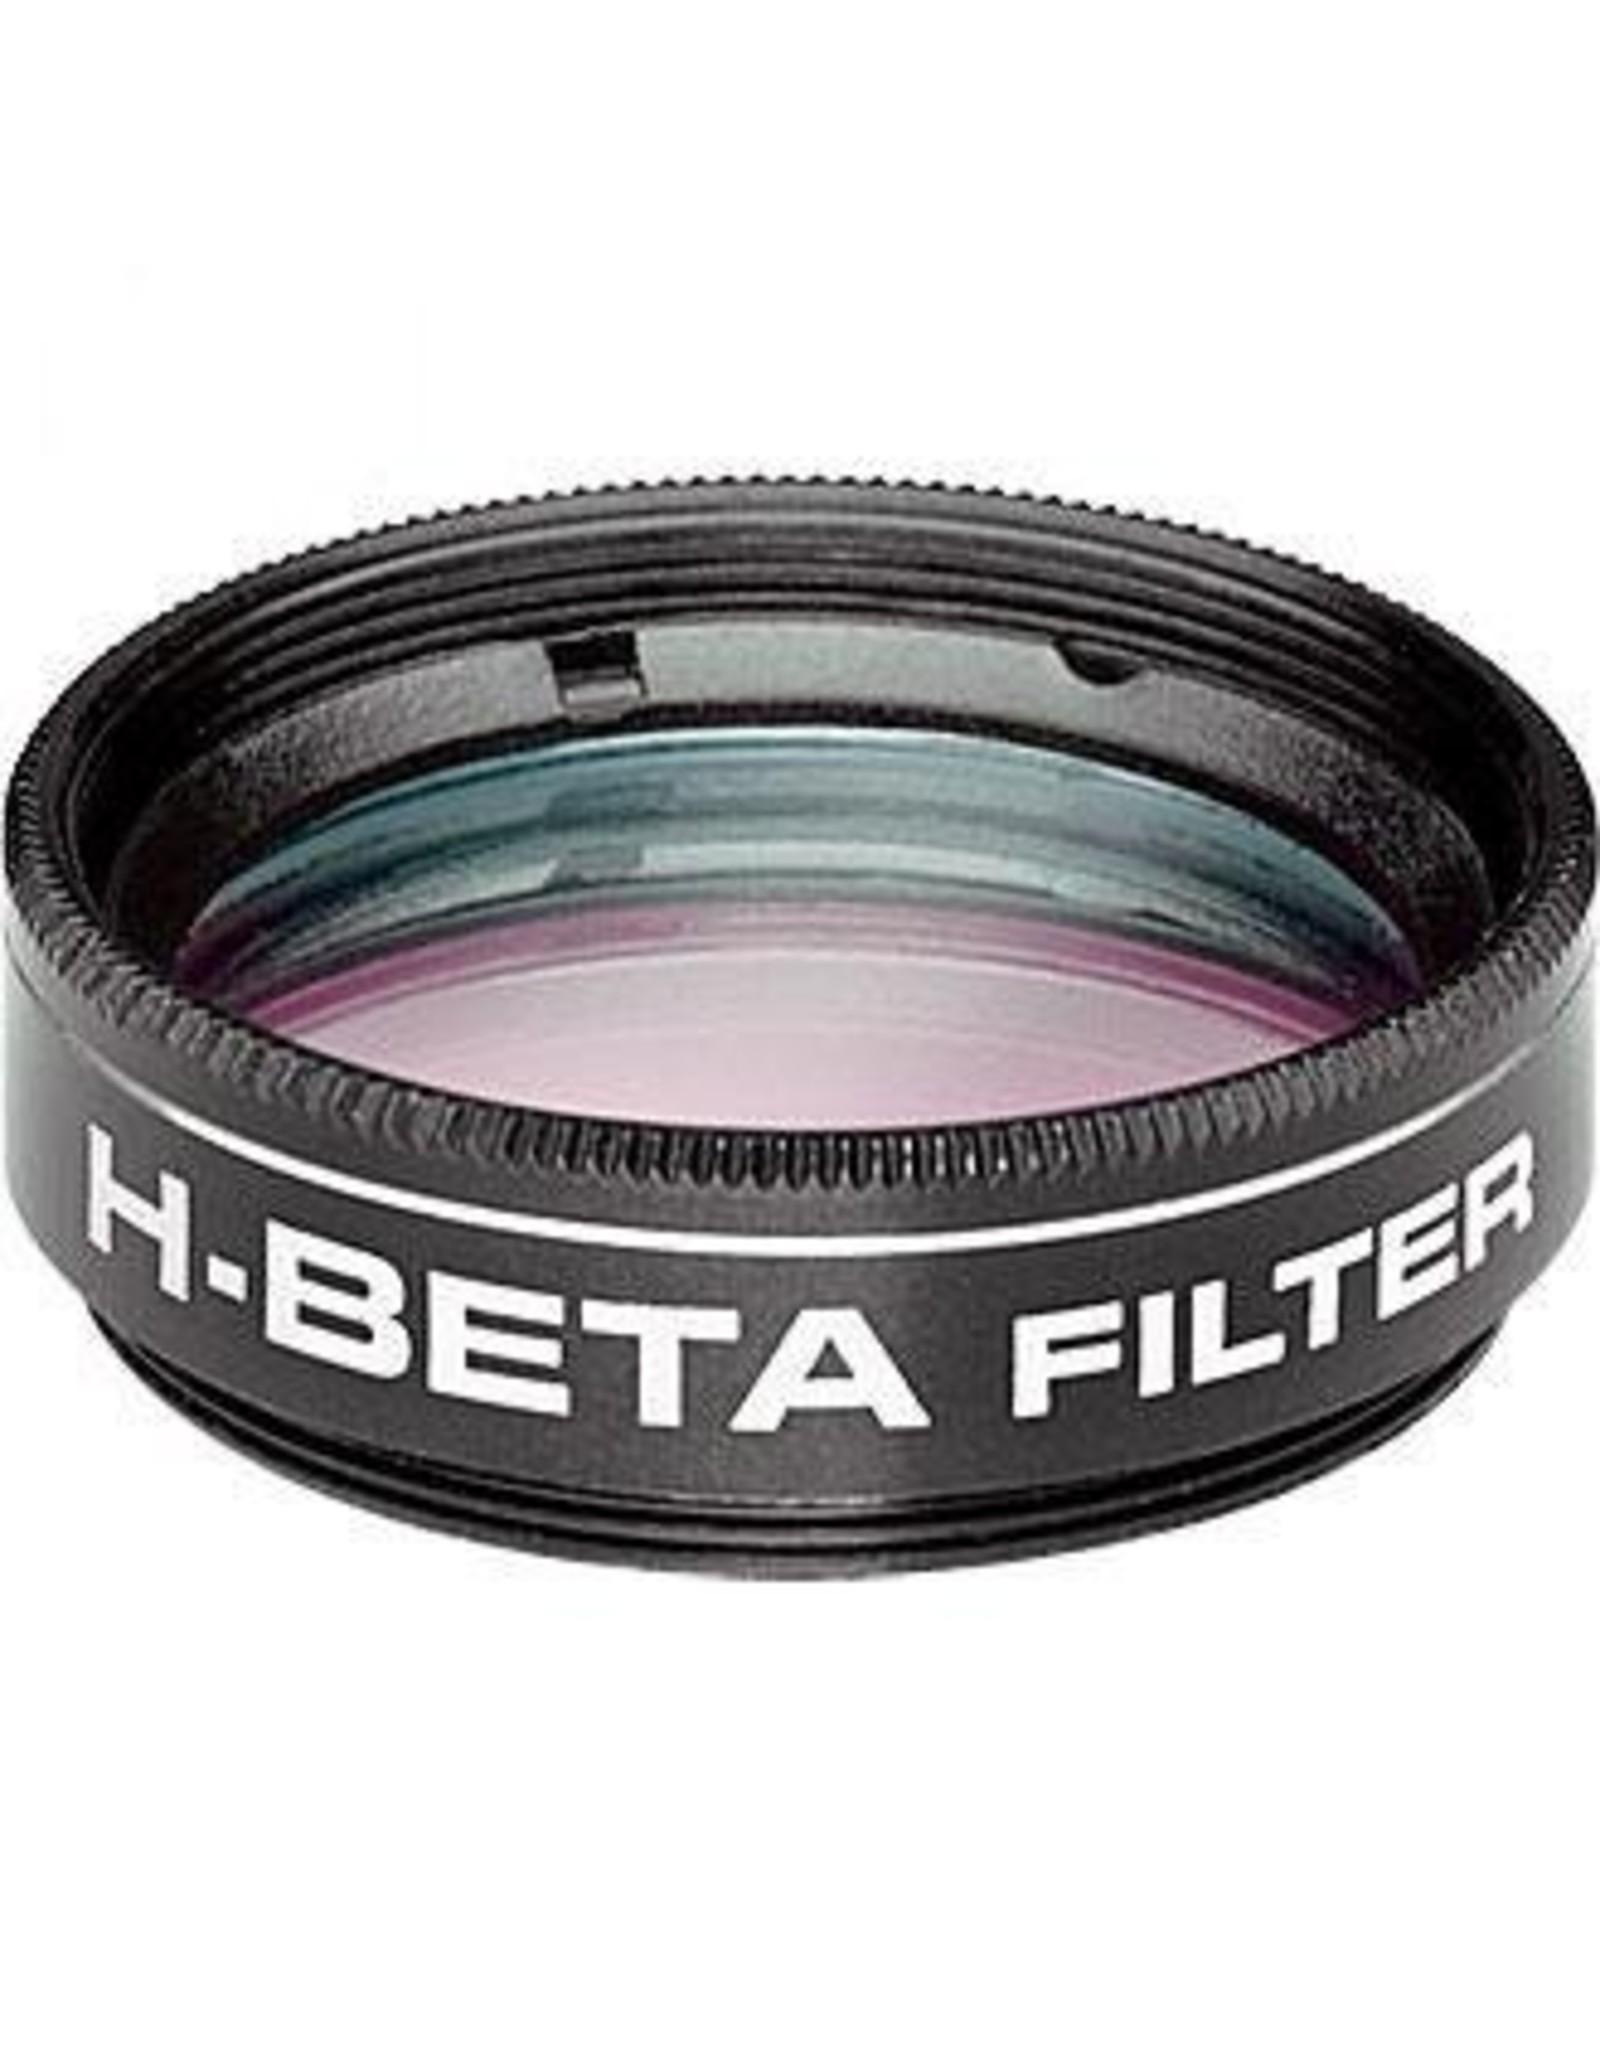 Arcturus Arcturus Hydrogen-Beta Filter 1.25